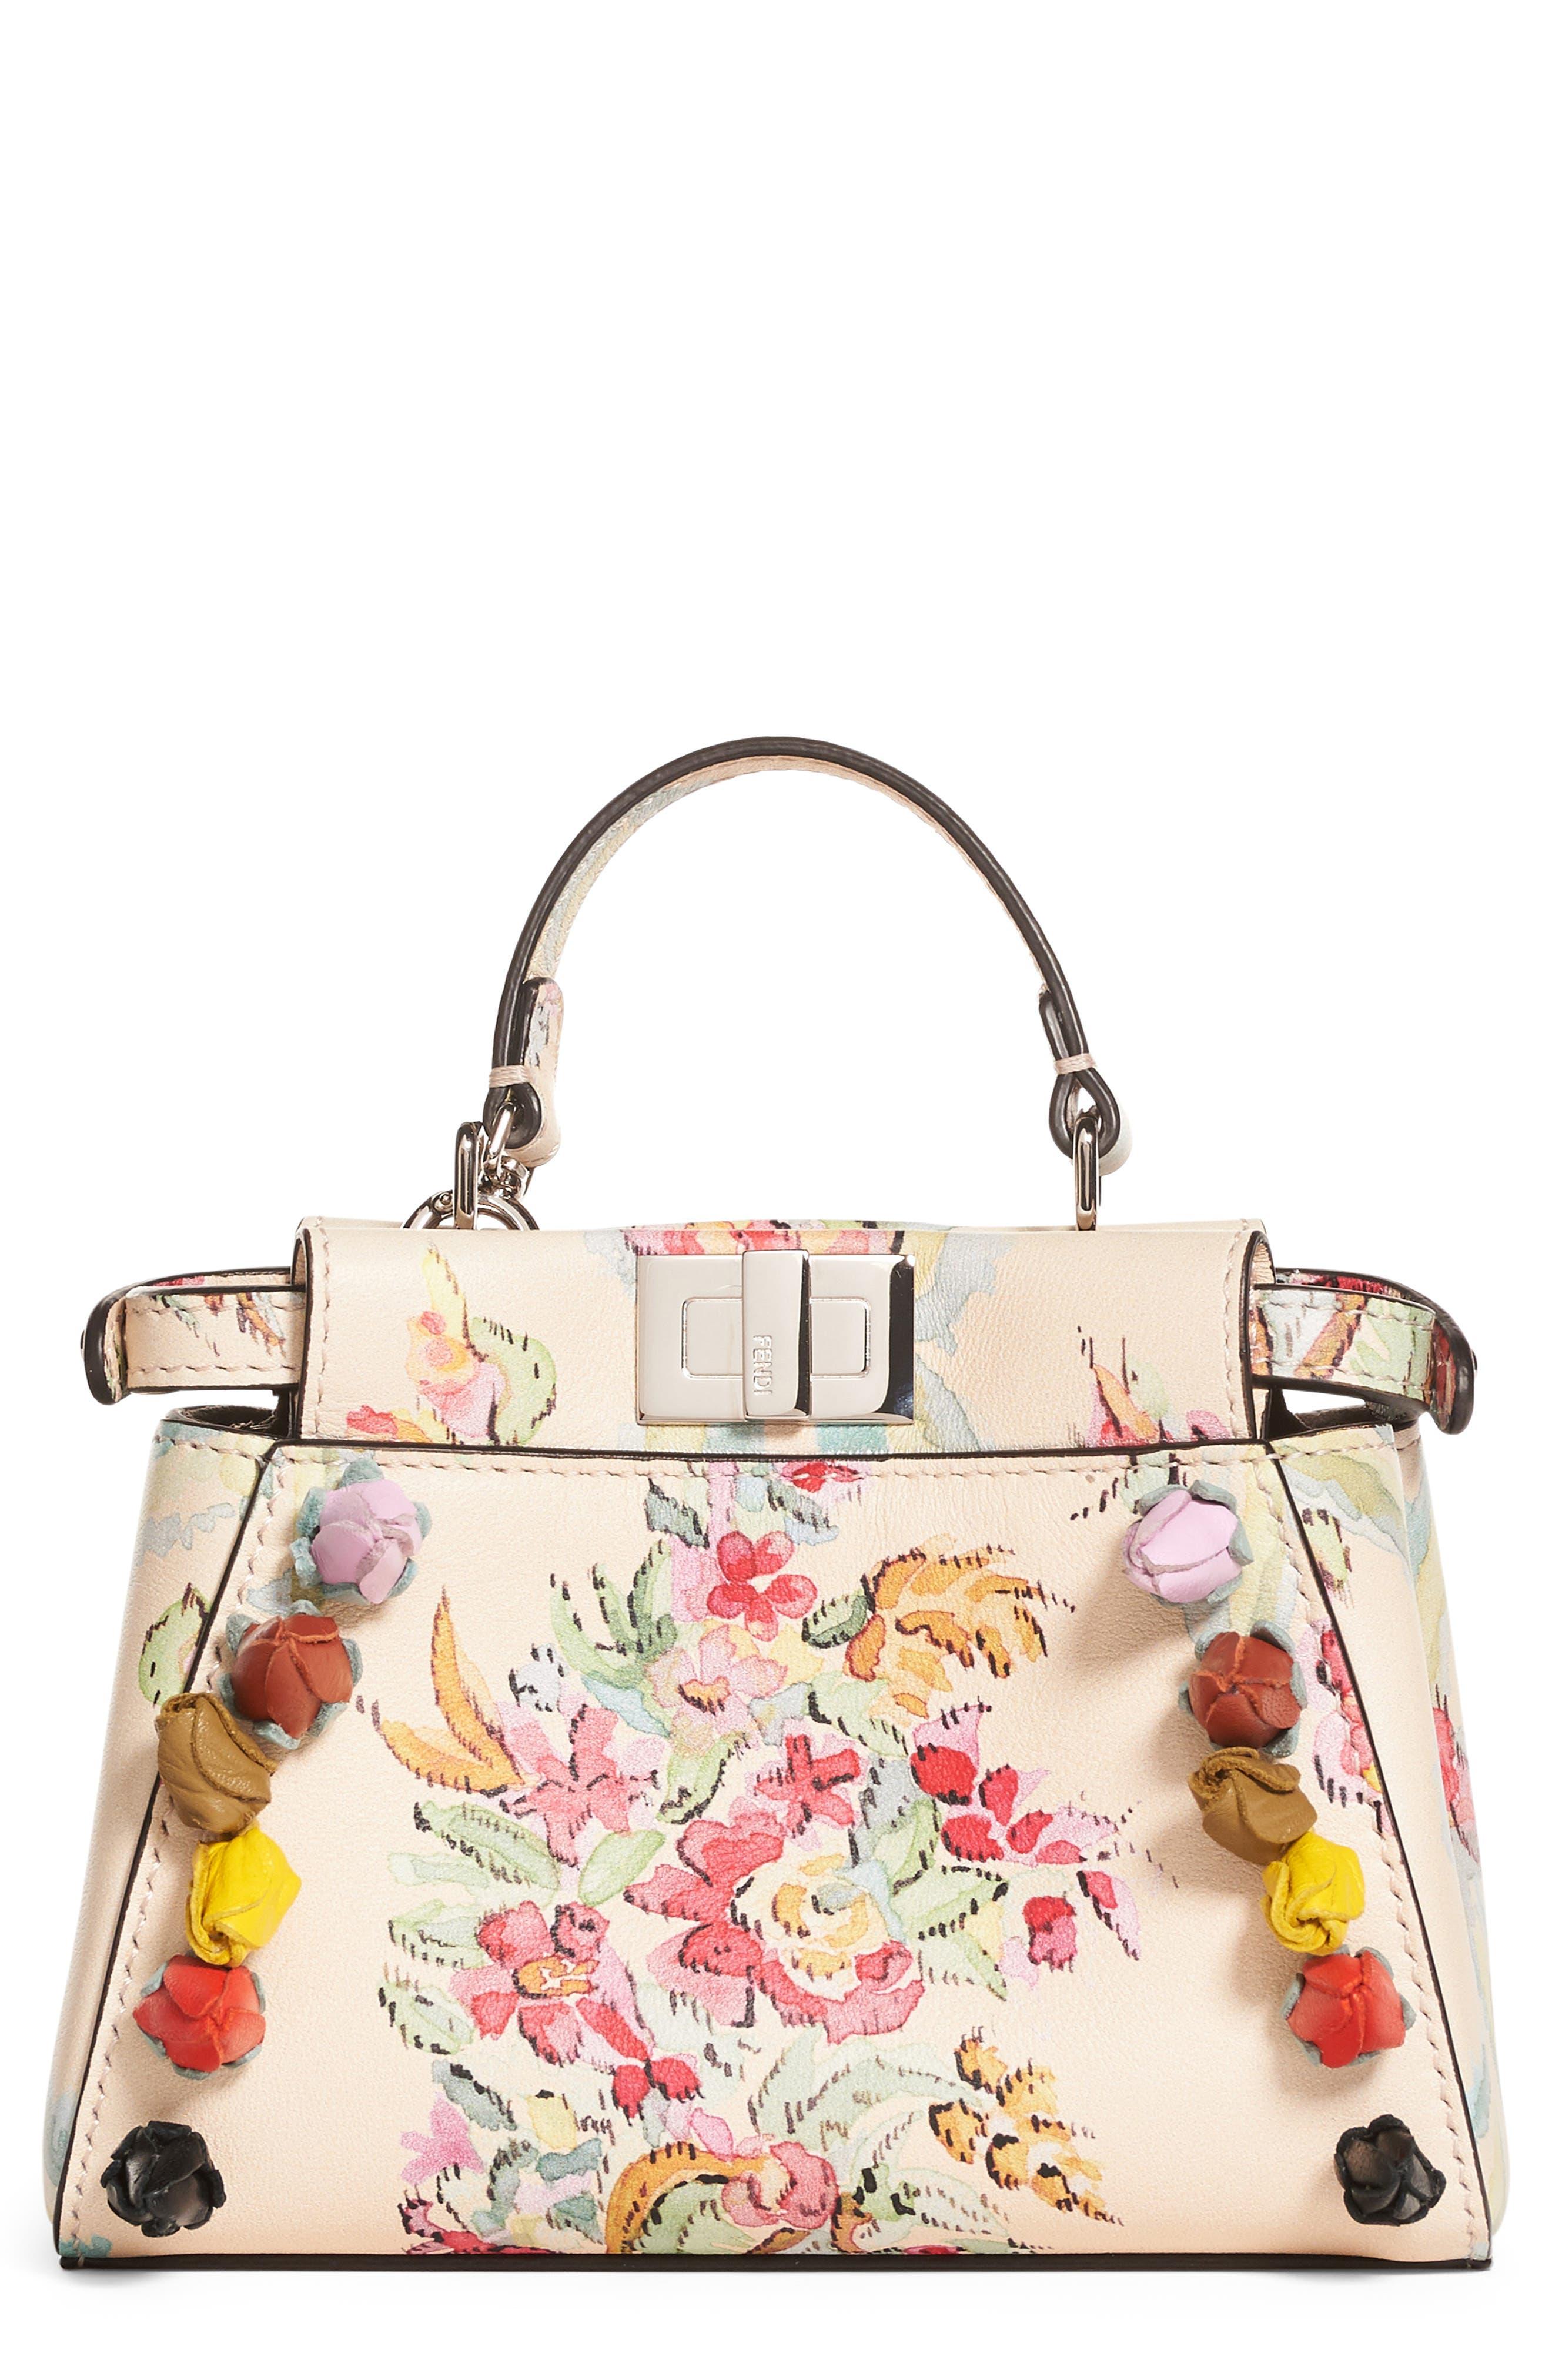 Alternate Image 1 Selected - Fendi Micro Peekaboo Floral Appliqué Leather Satchel